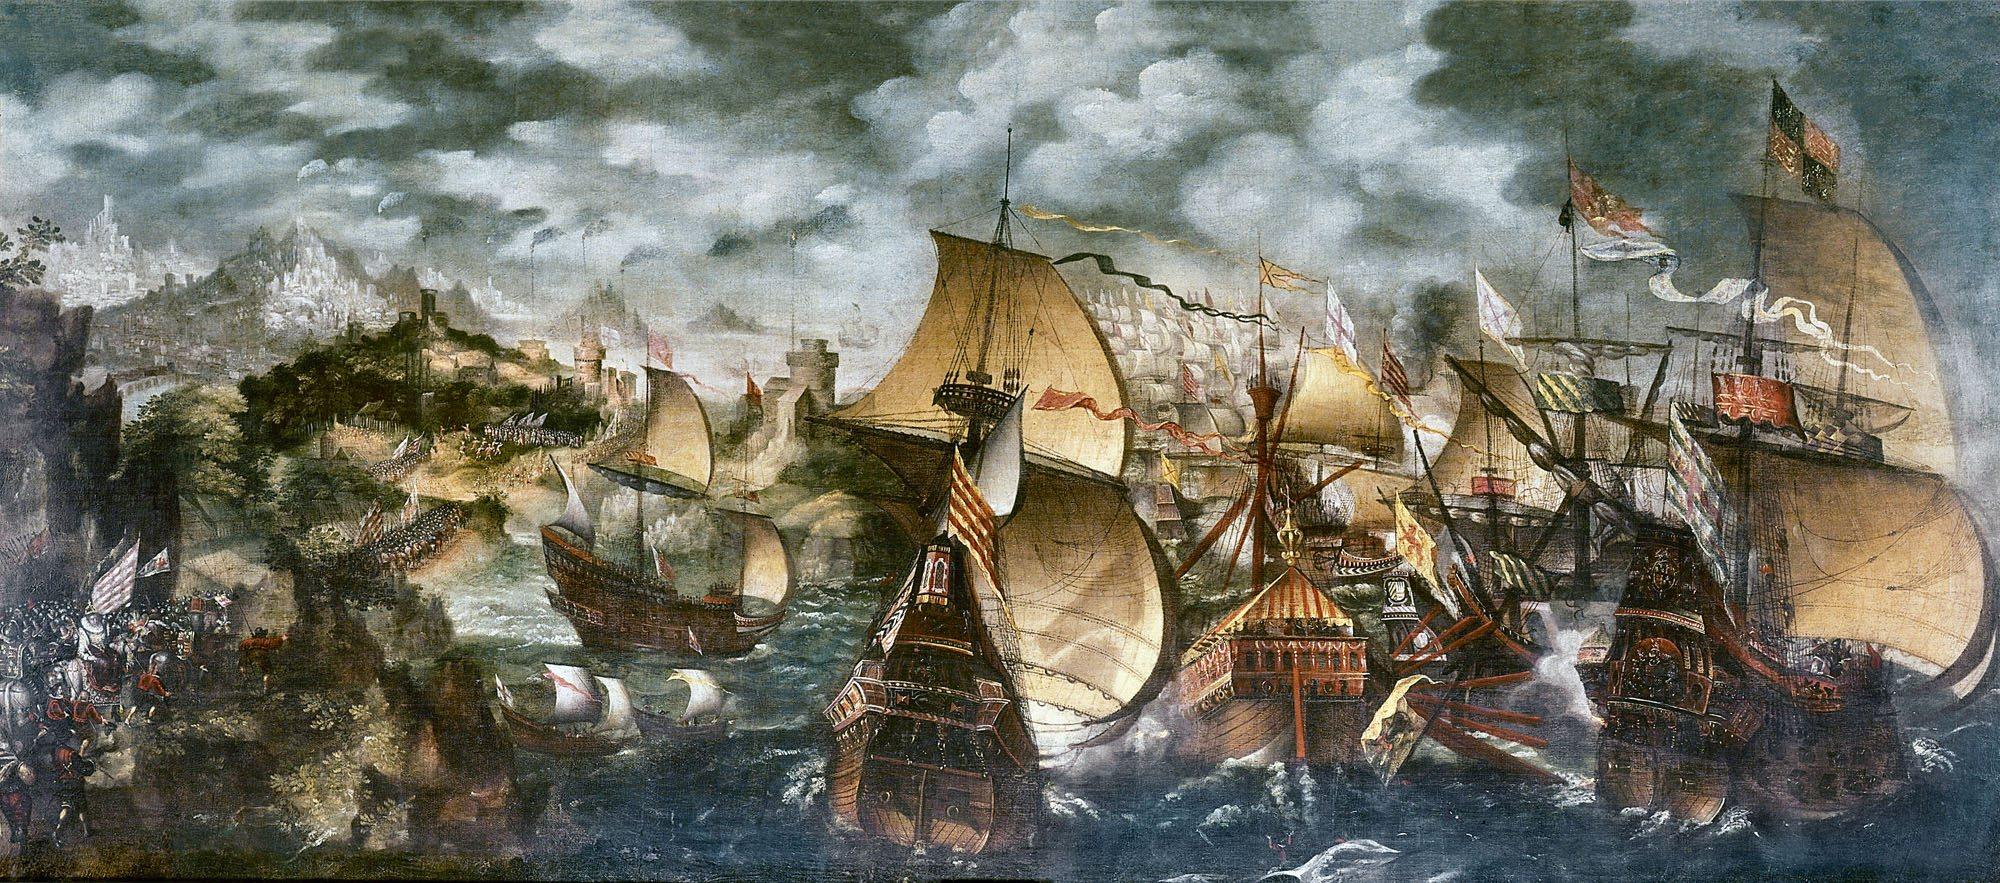 HistoCast 32 – Armada invencible